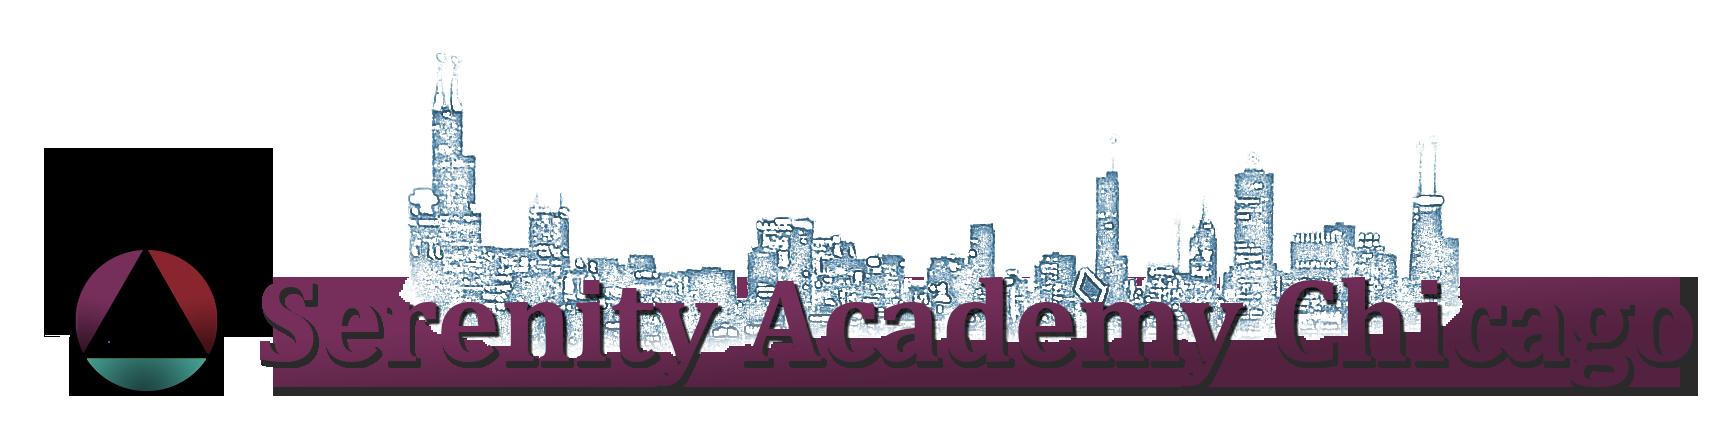 Serenity Academy Chicago